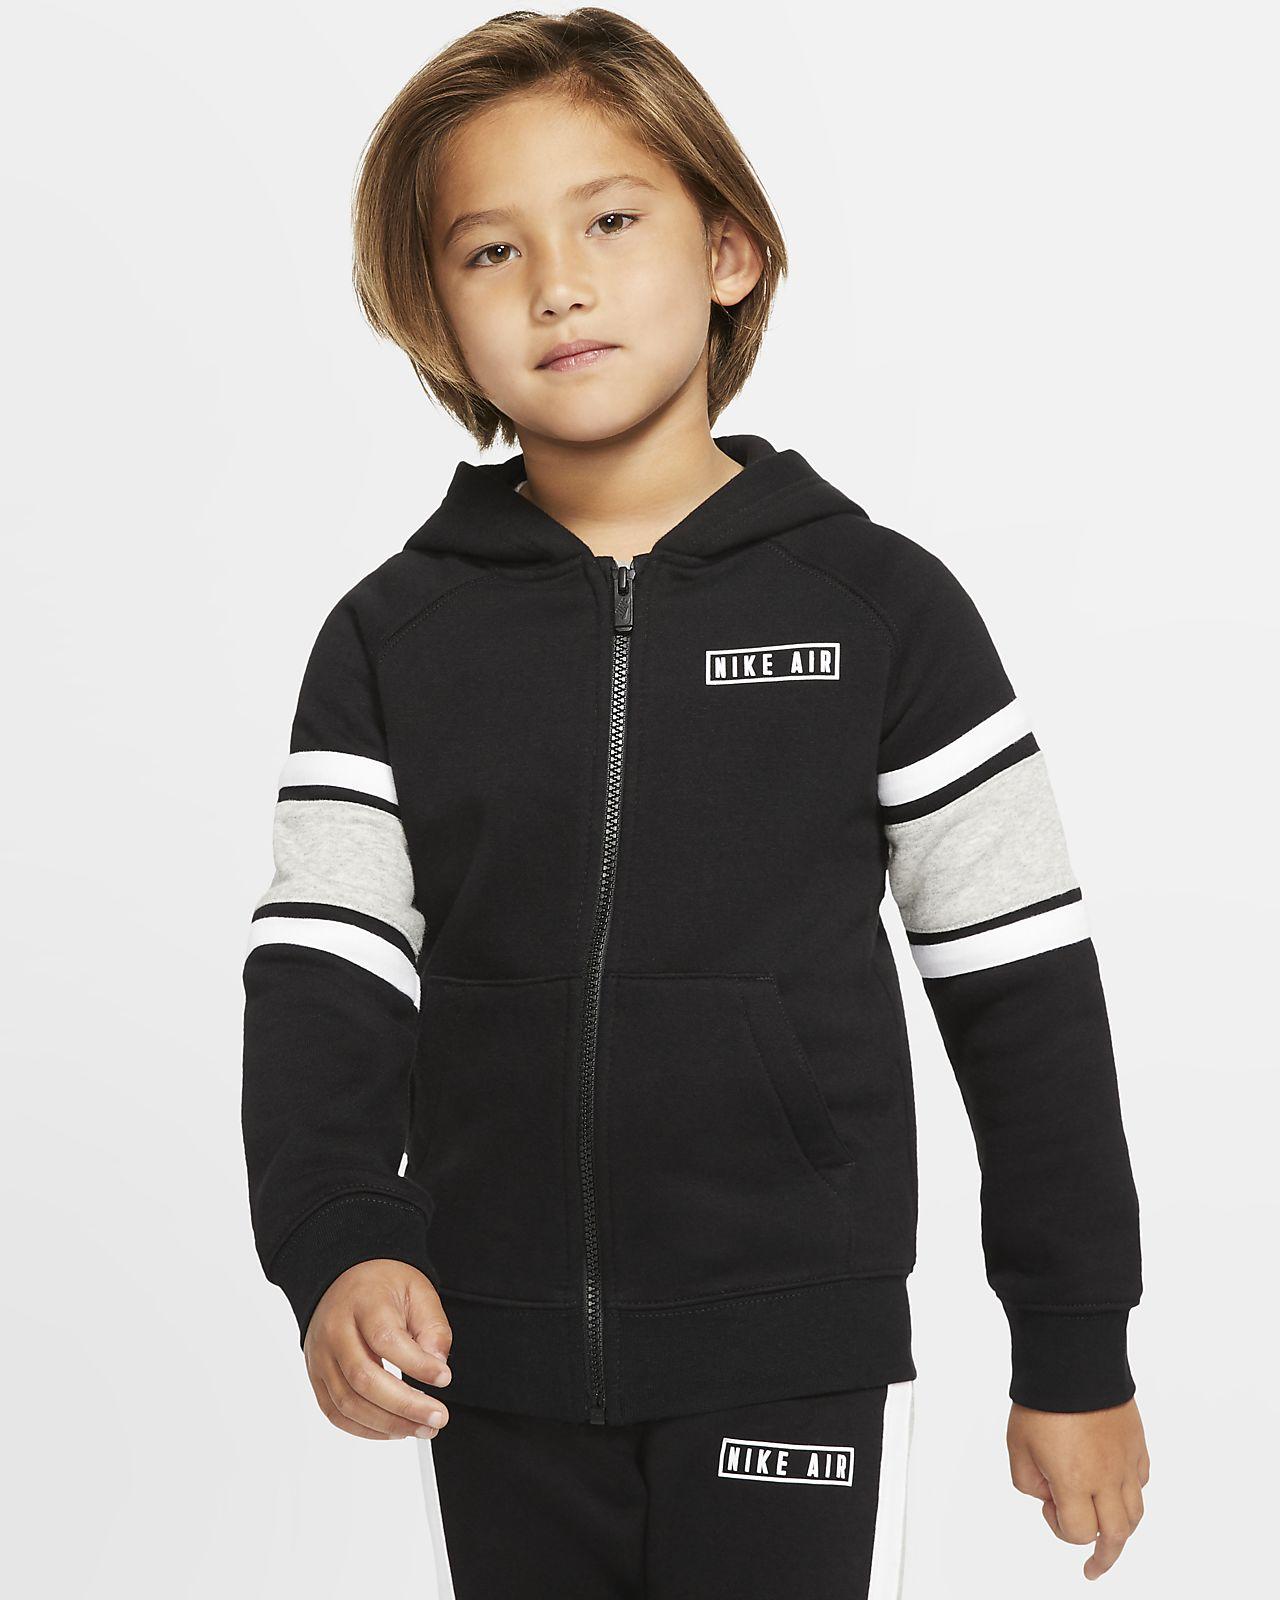 Nike Air幼童 2 件套